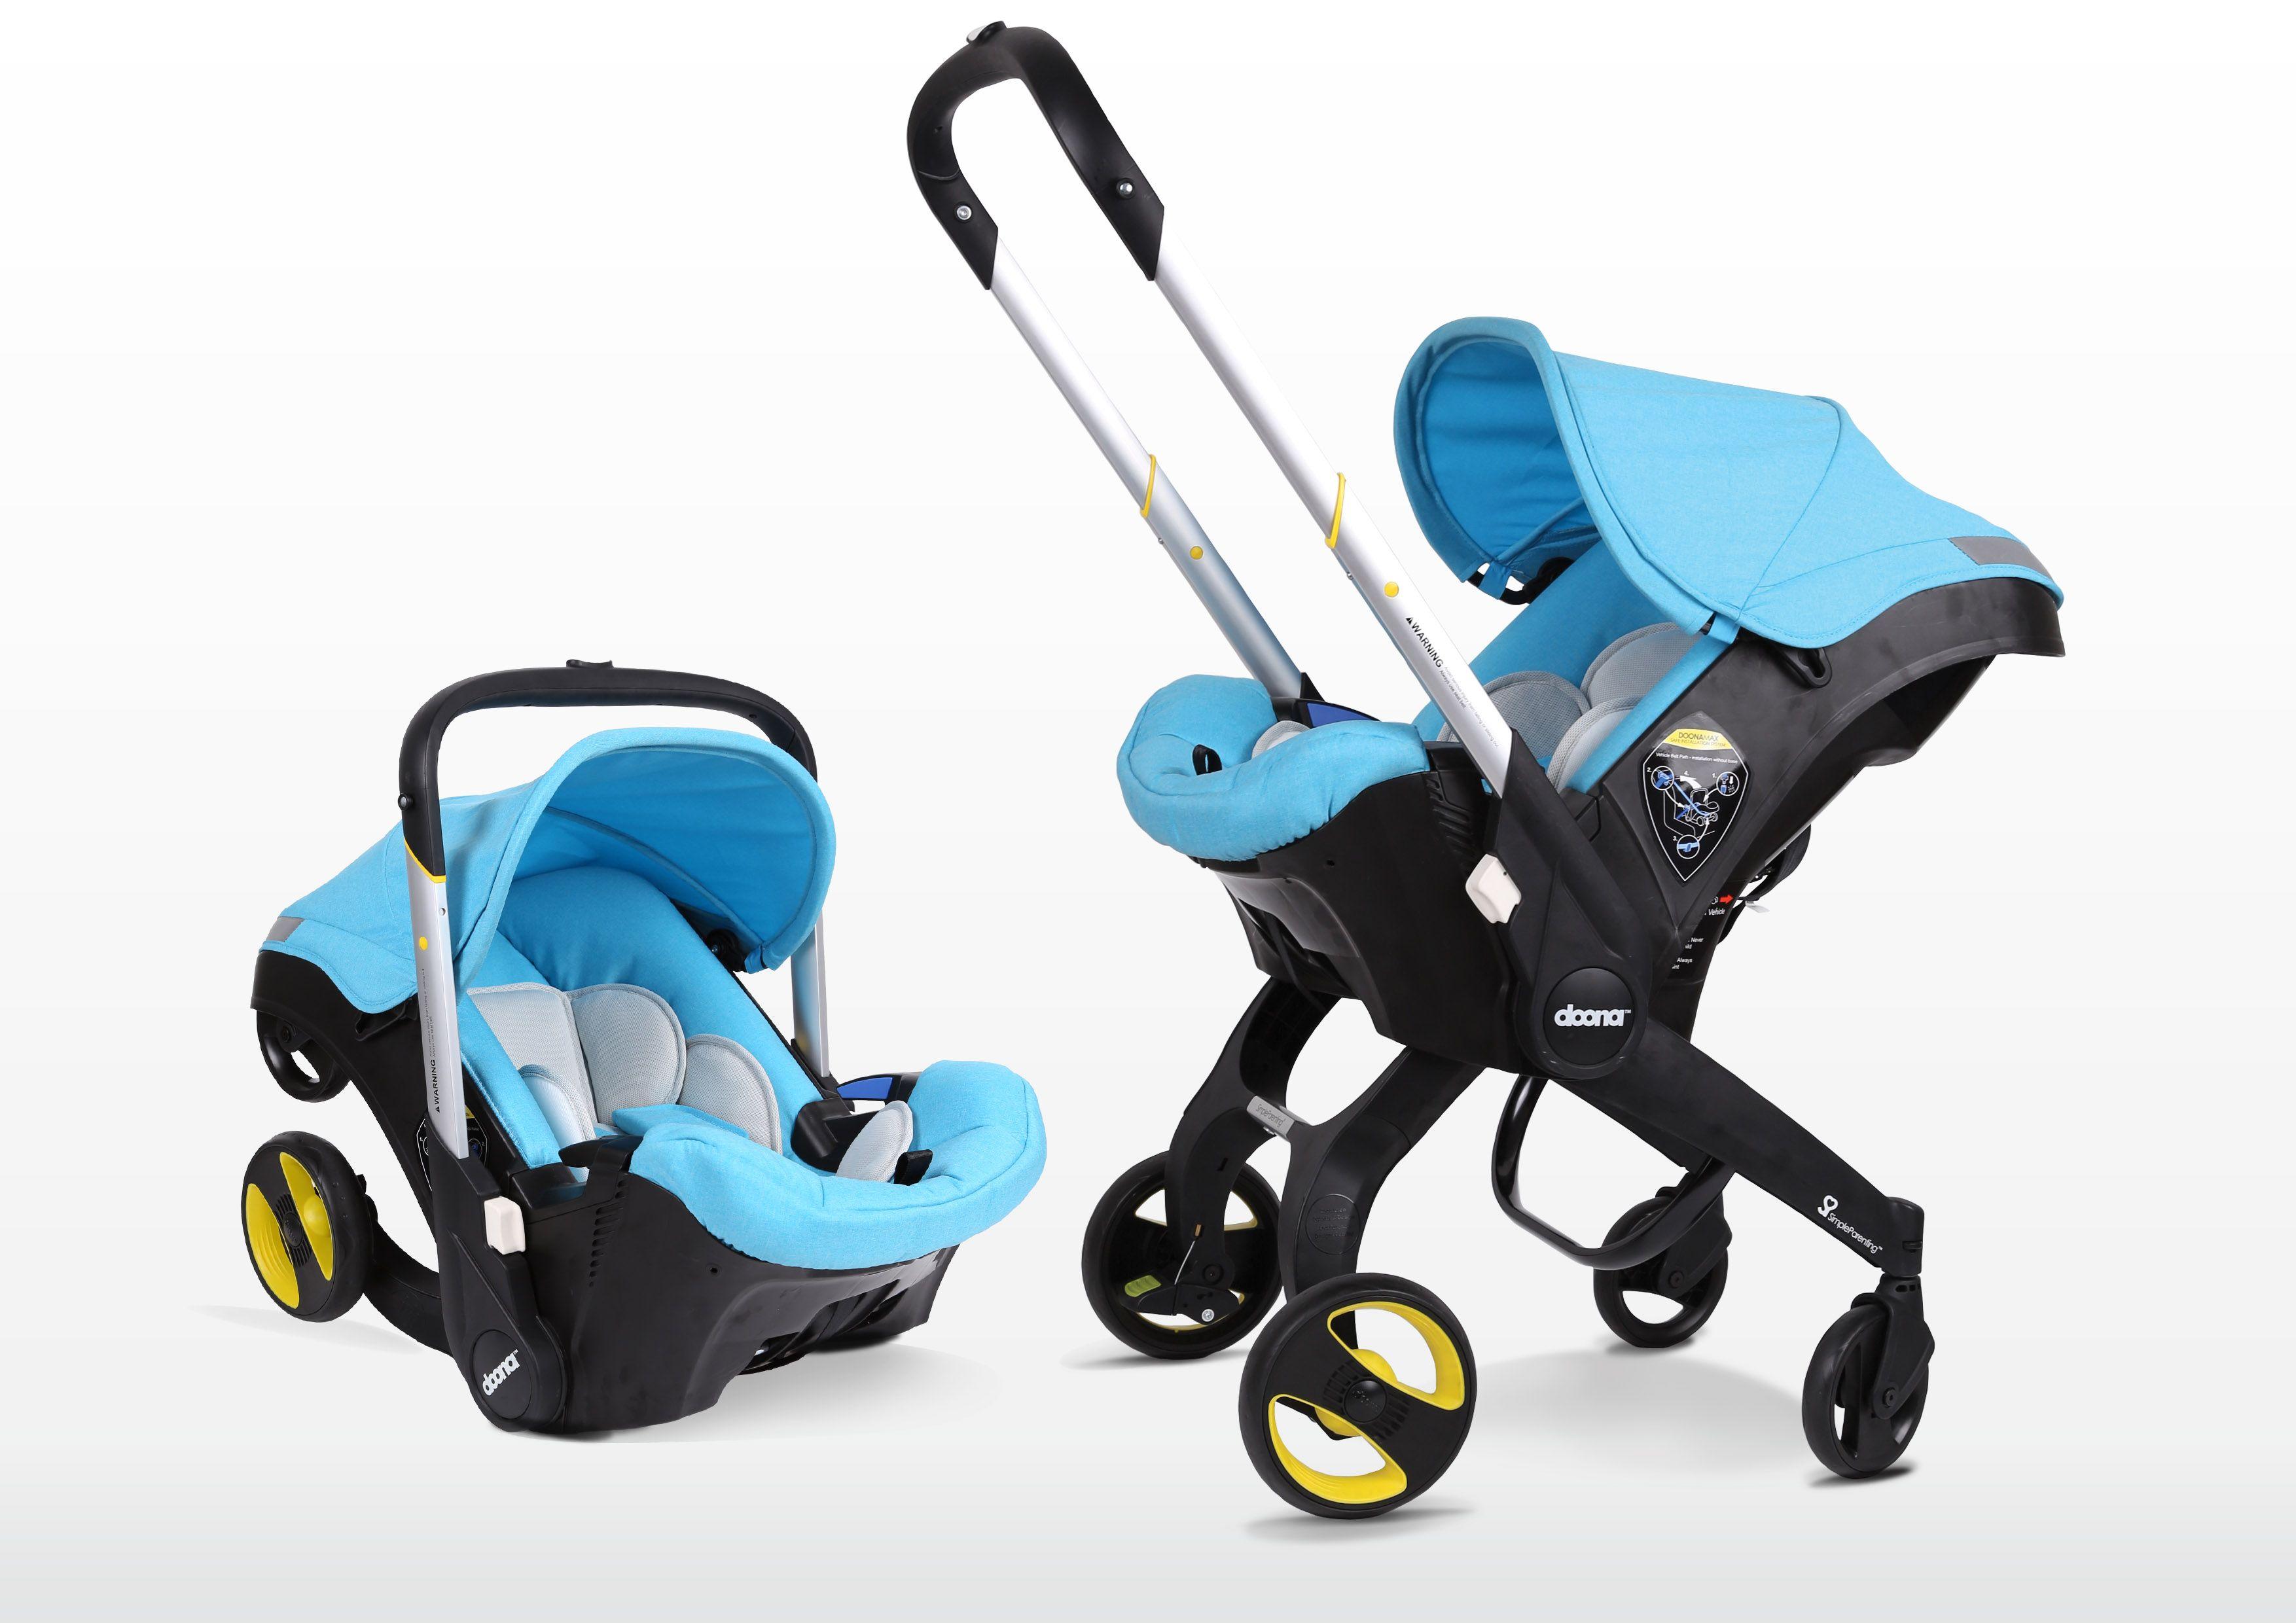 Sky Doona Car Seat doonacarseat Baby car seats